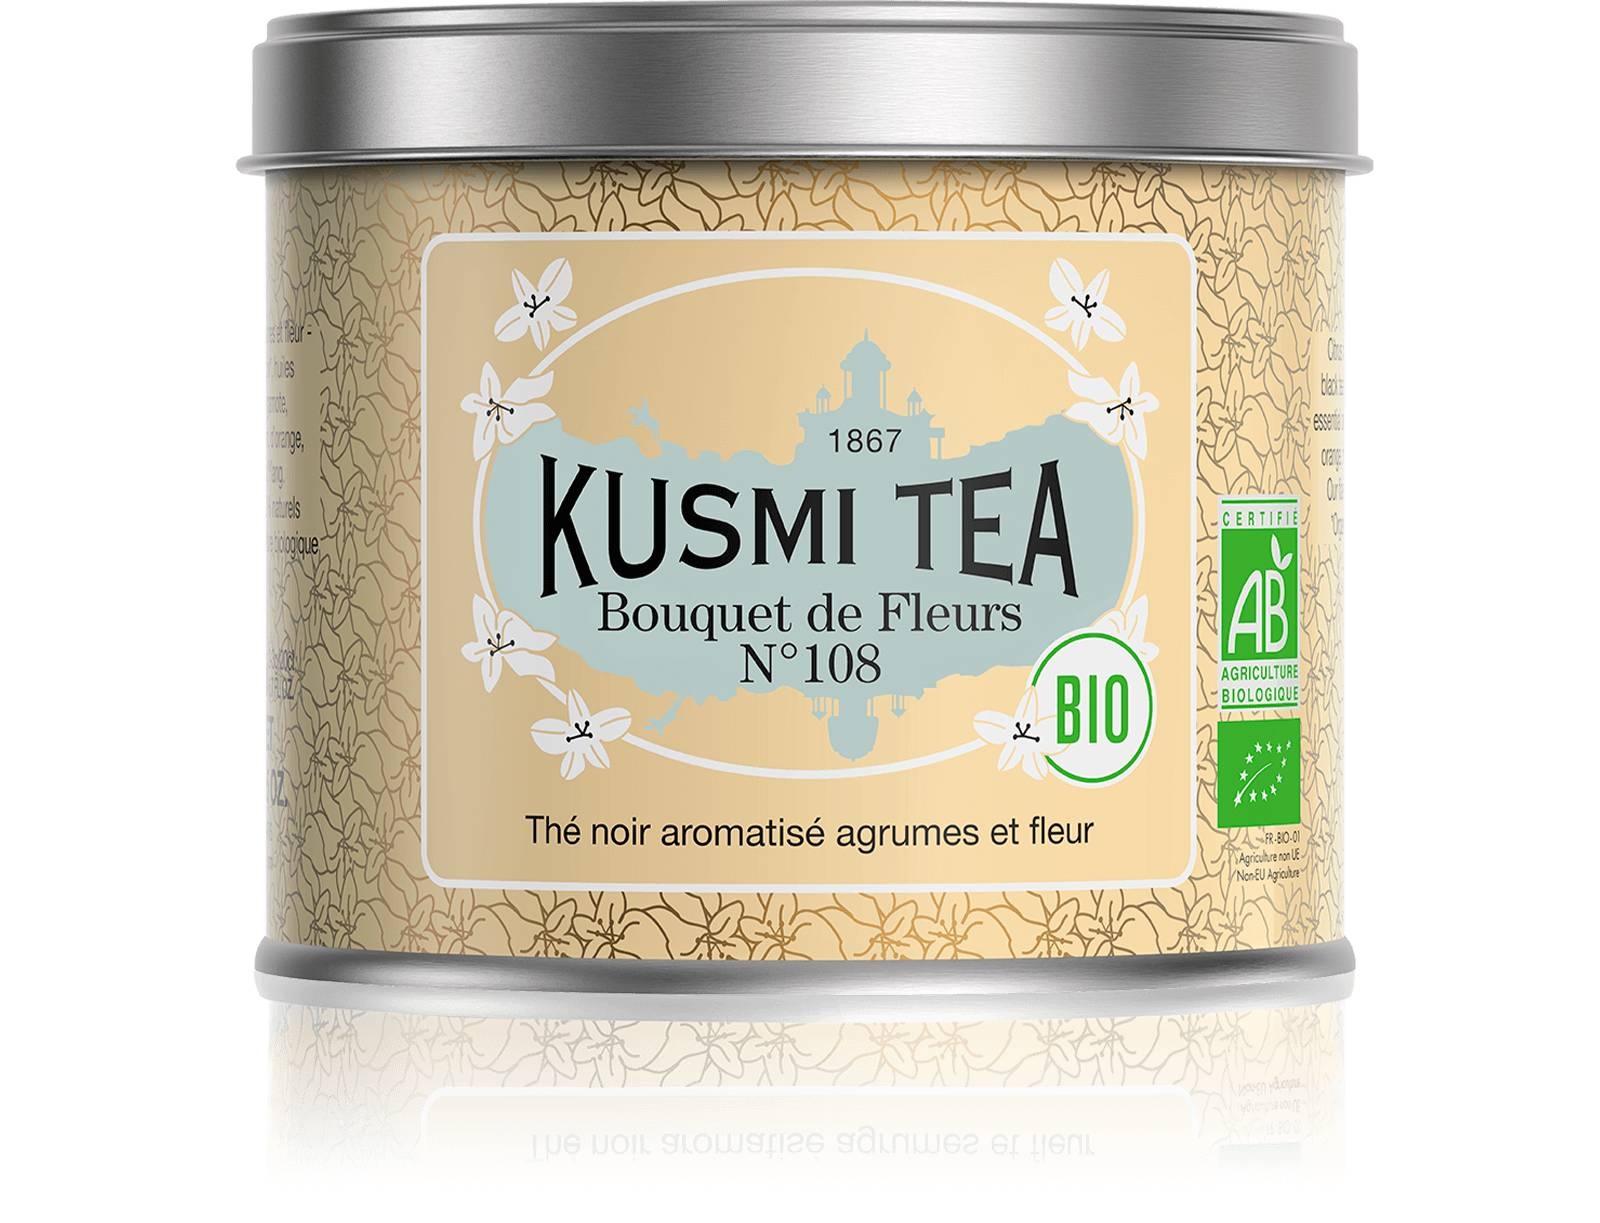 KUSMI TEA Bouquet de Fleurs N°108 bio - Thé earl grey, fleur Ylang-Ylang - Boîte de thé en vrac - Kusmi Tea